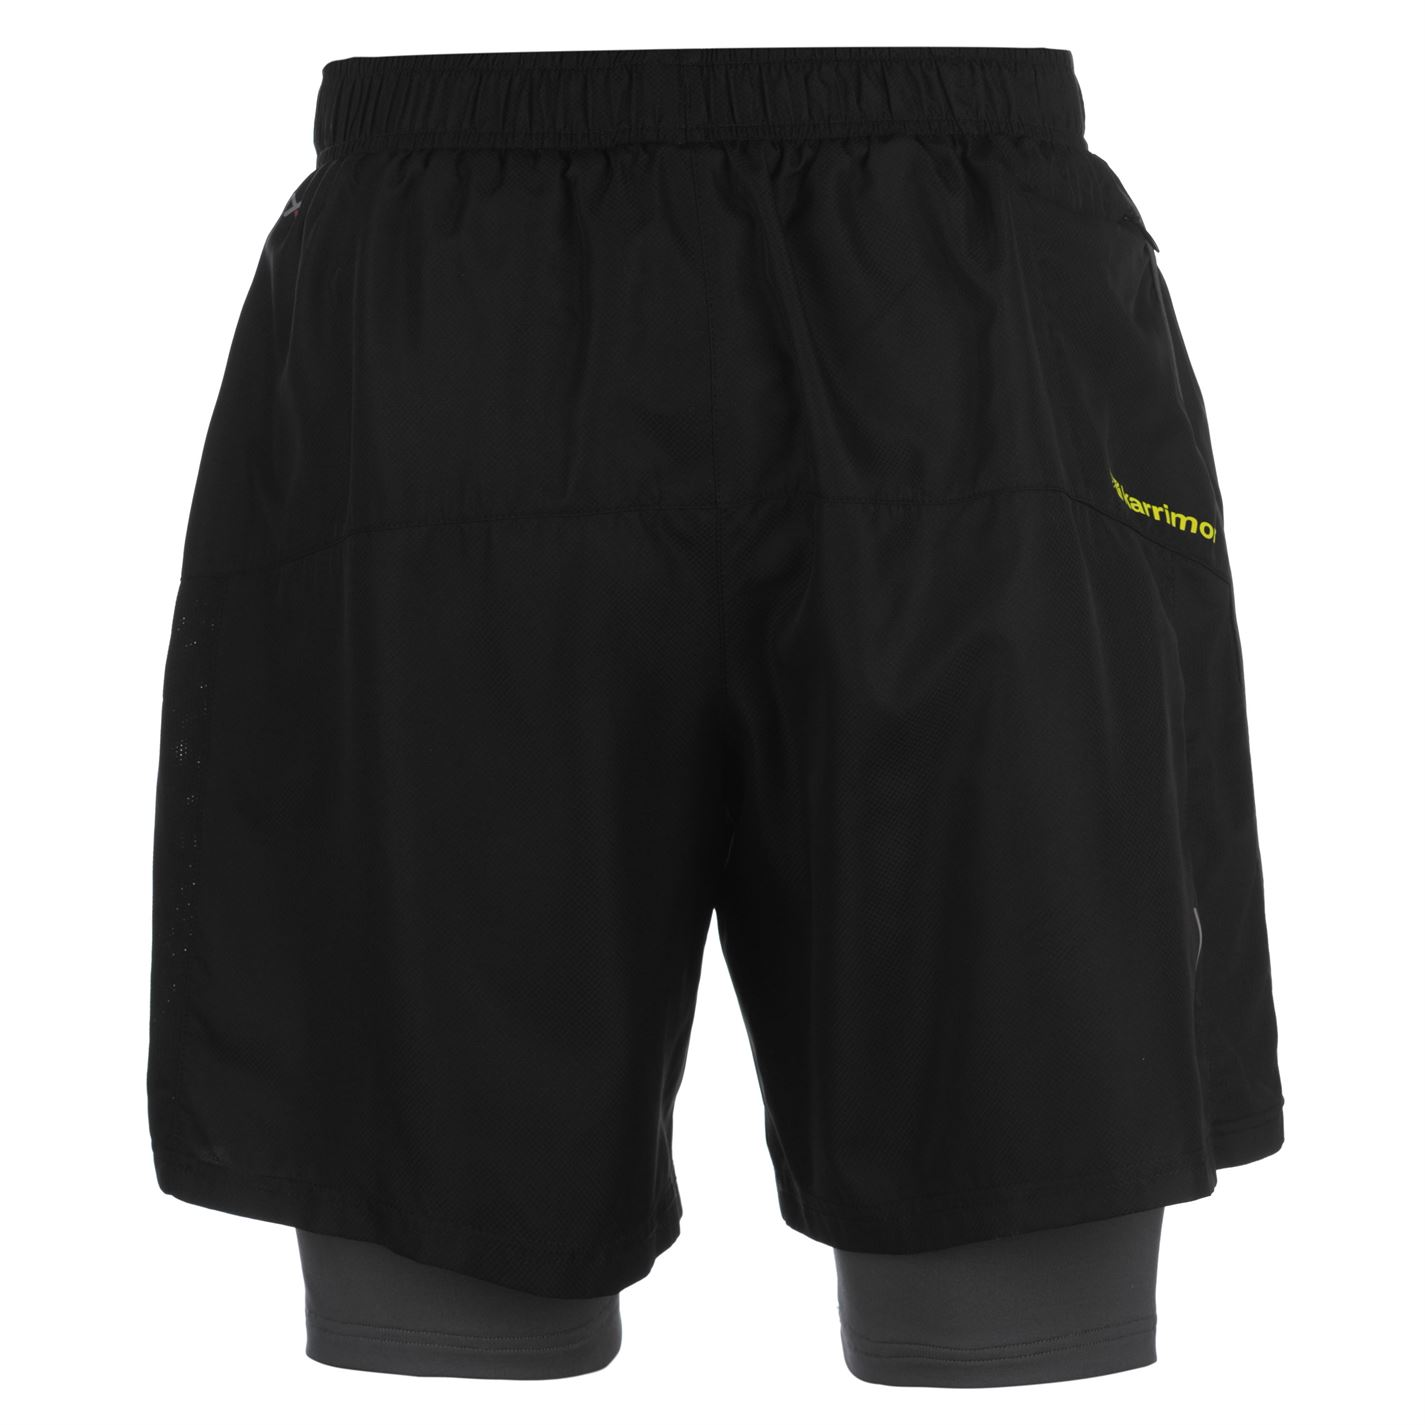 Karrimor-XLite-2in1-Shorts-Performance-Mens thumbnail 7